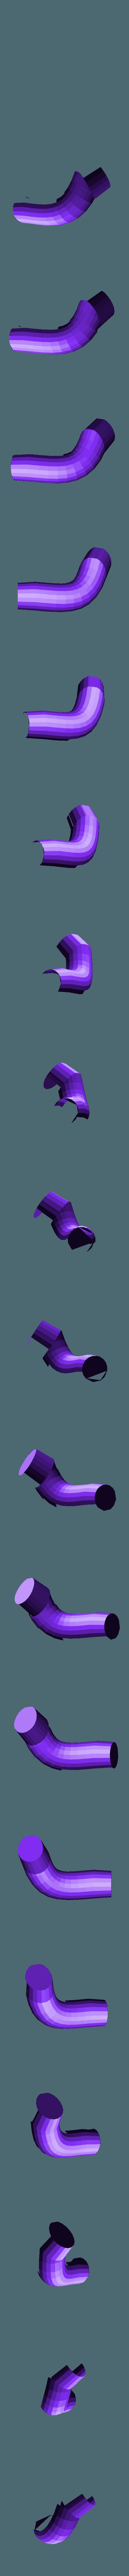 orange_leg_4_right.stl Download free STL file Wiggler from Mario games - multi-color • Template to 3D print, bpitanga